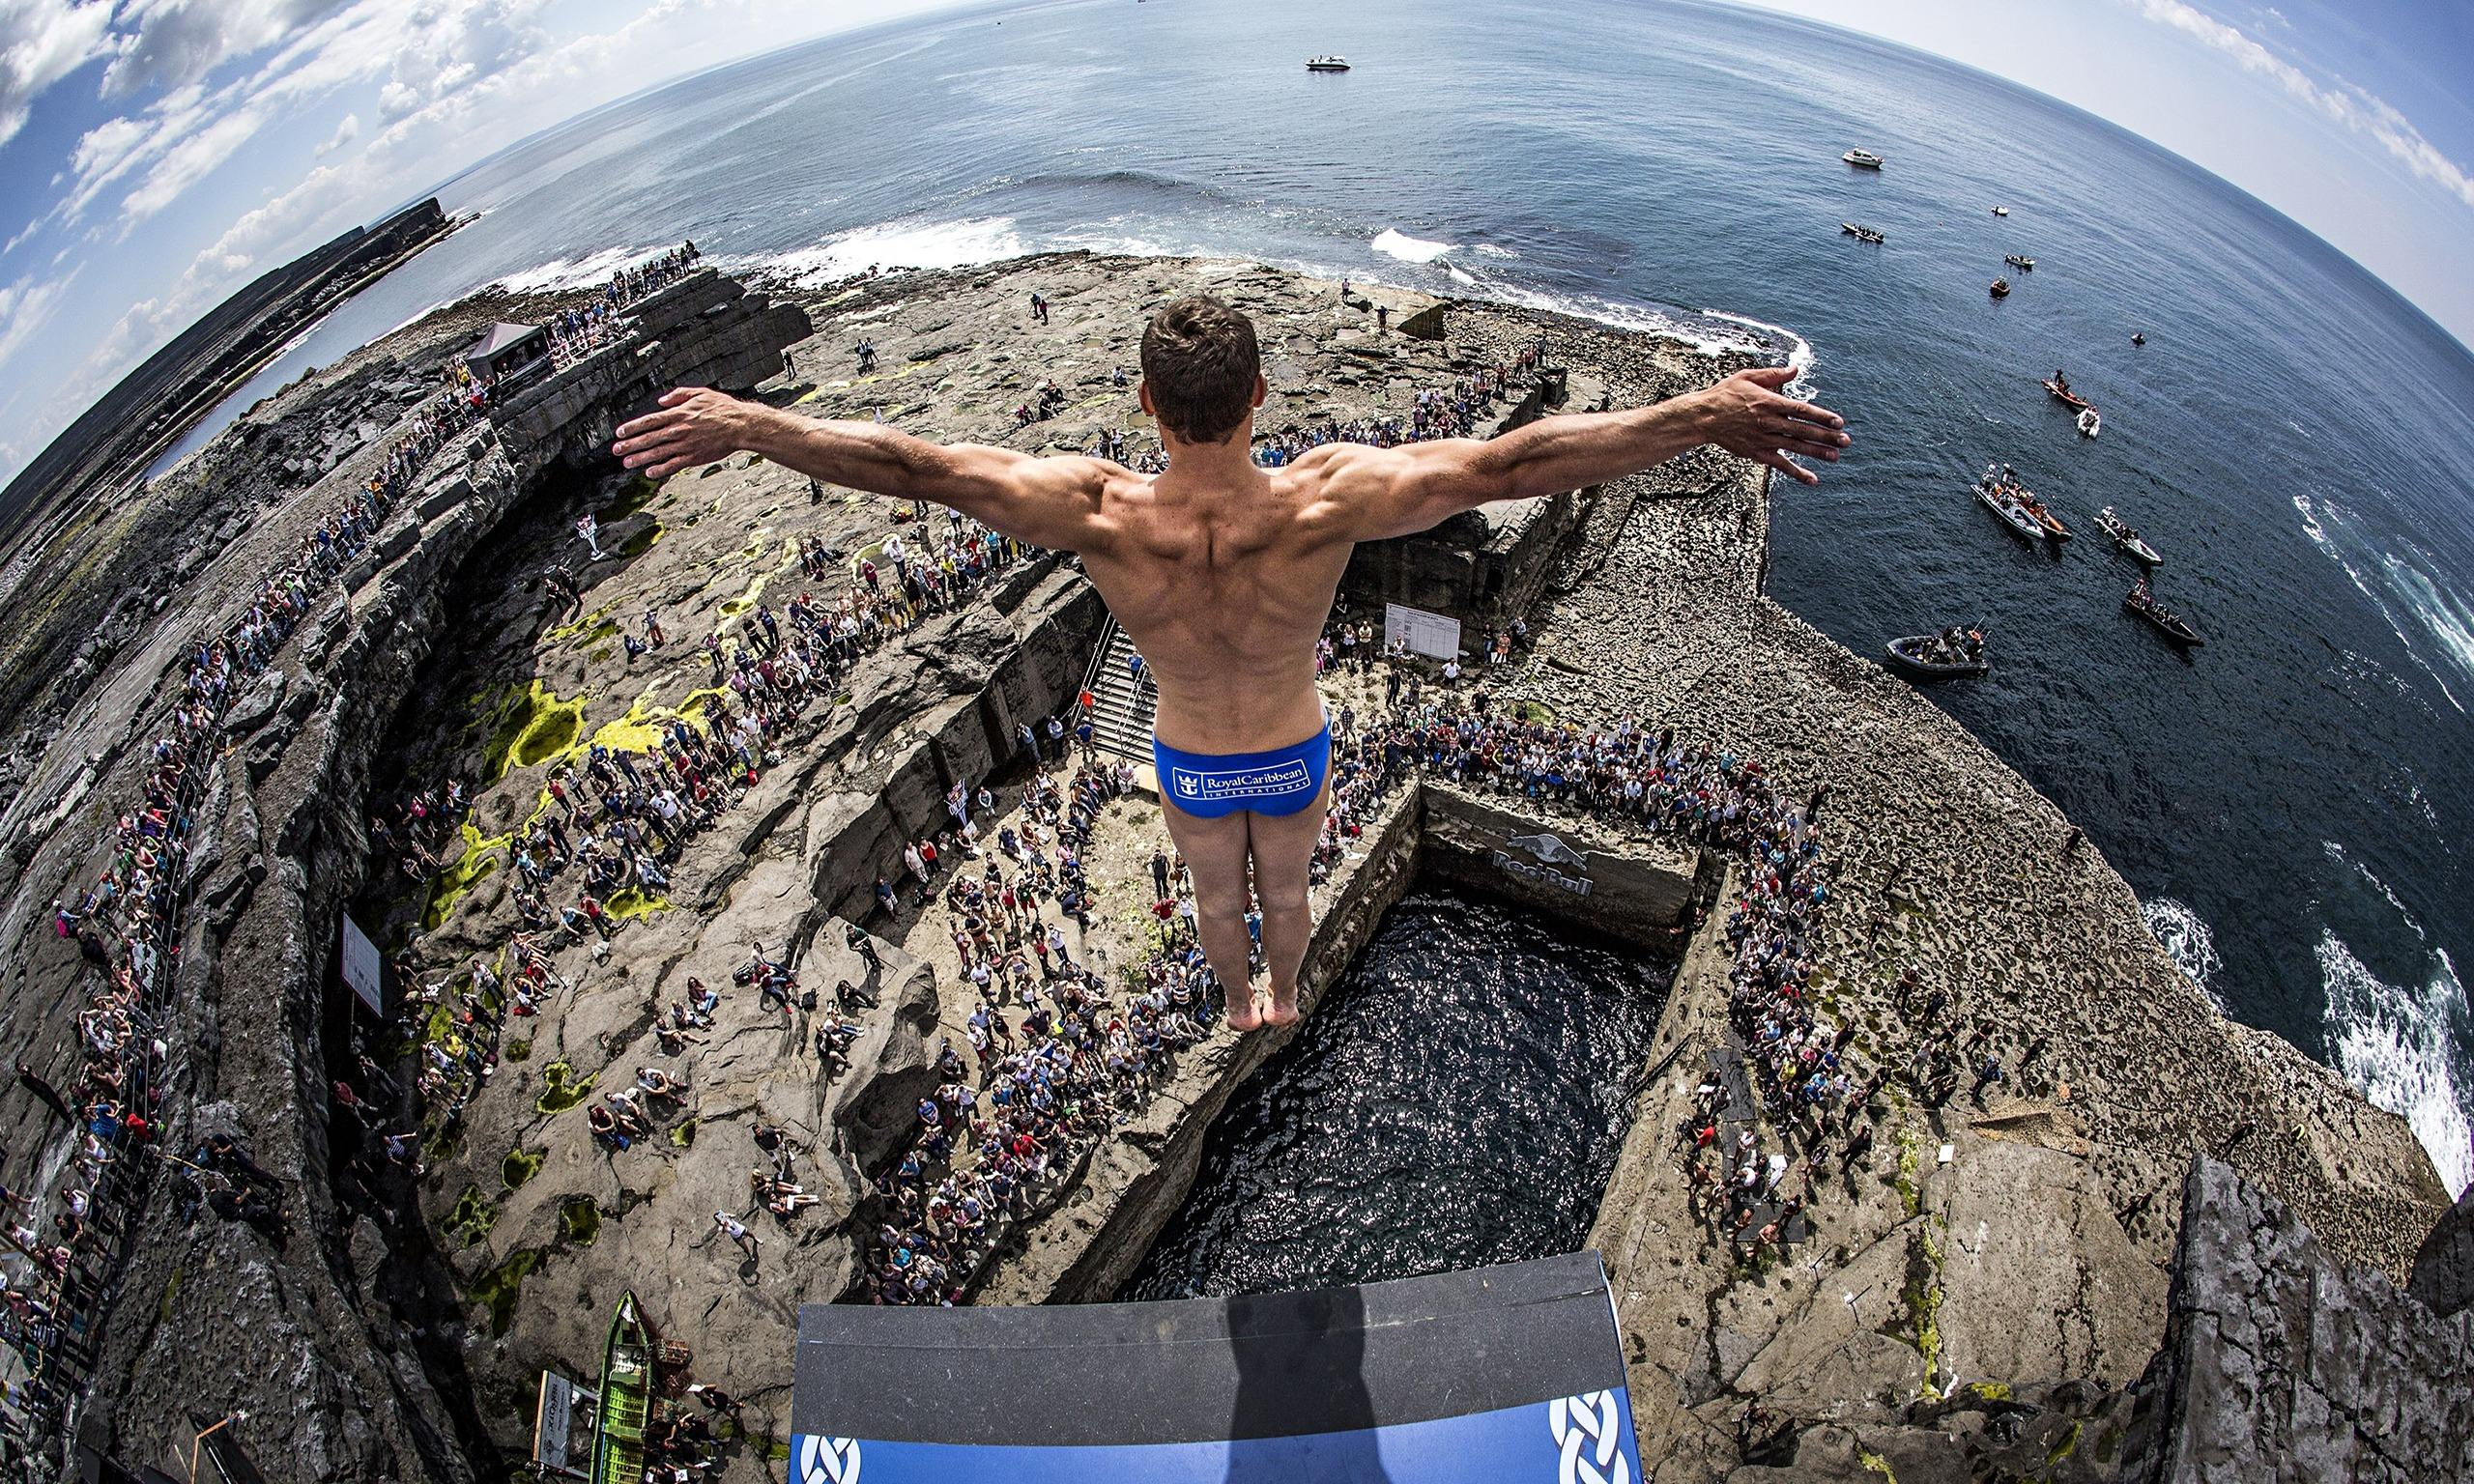 Eyewitness inishmore ireland world news the guardian - Highest cliff dive ...